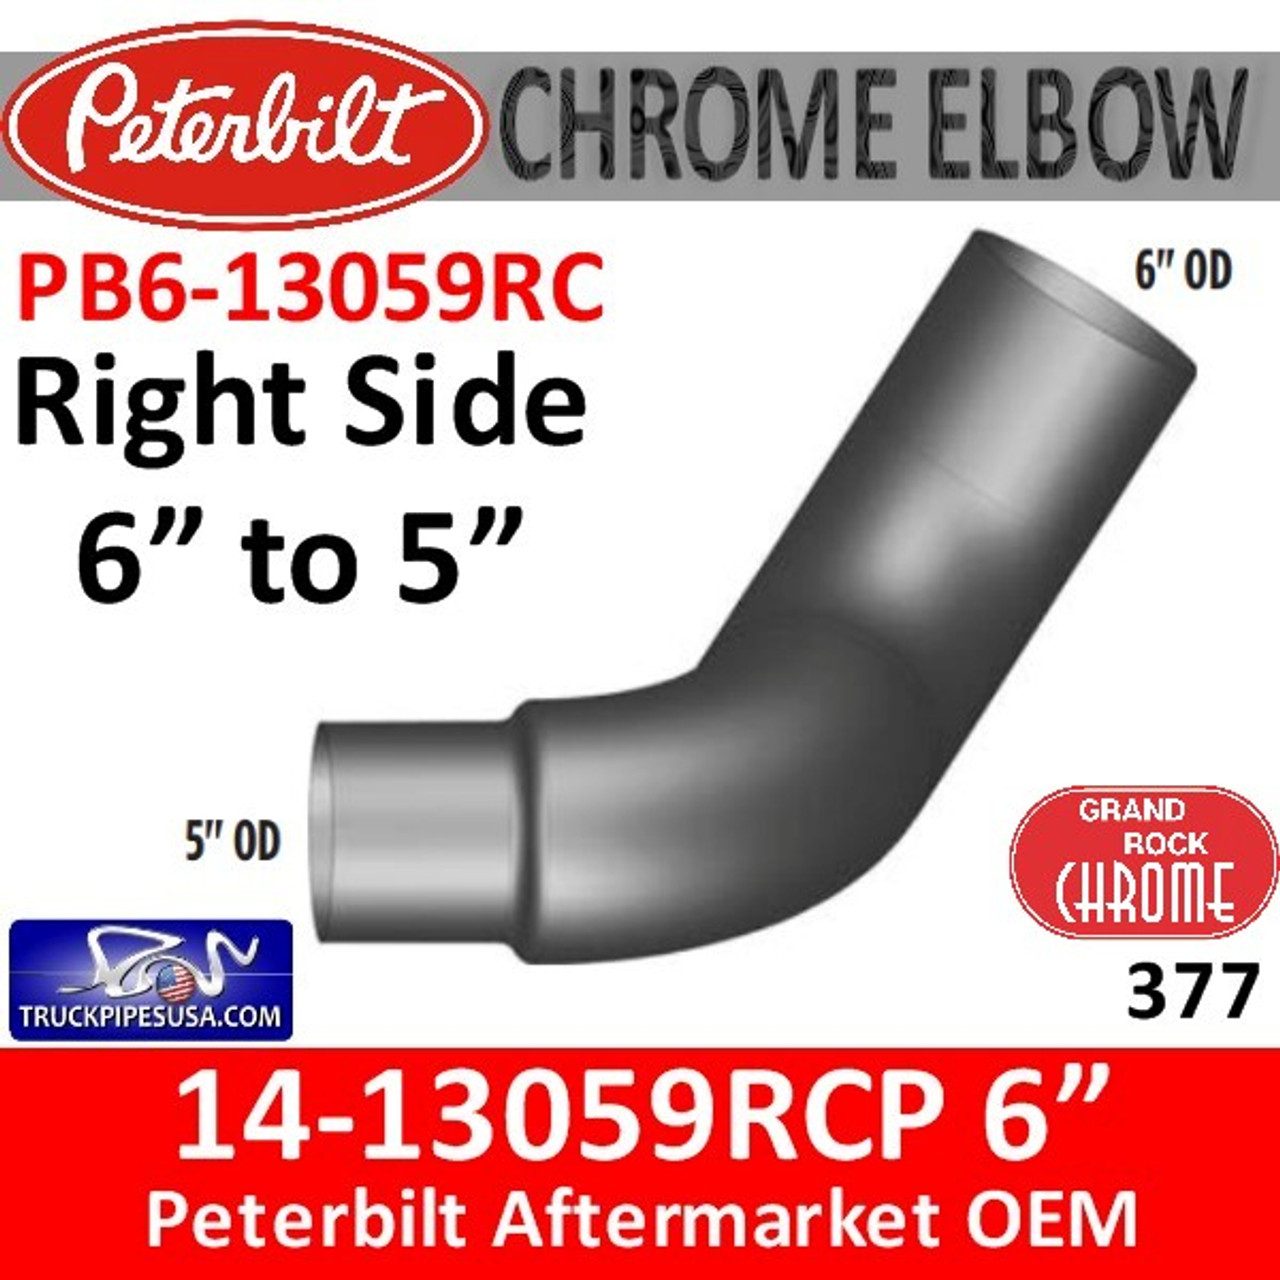 "14-13059RCP Peterbilt 377 6"" to 5"" Right Chrome Elbow PB6-13059RC"